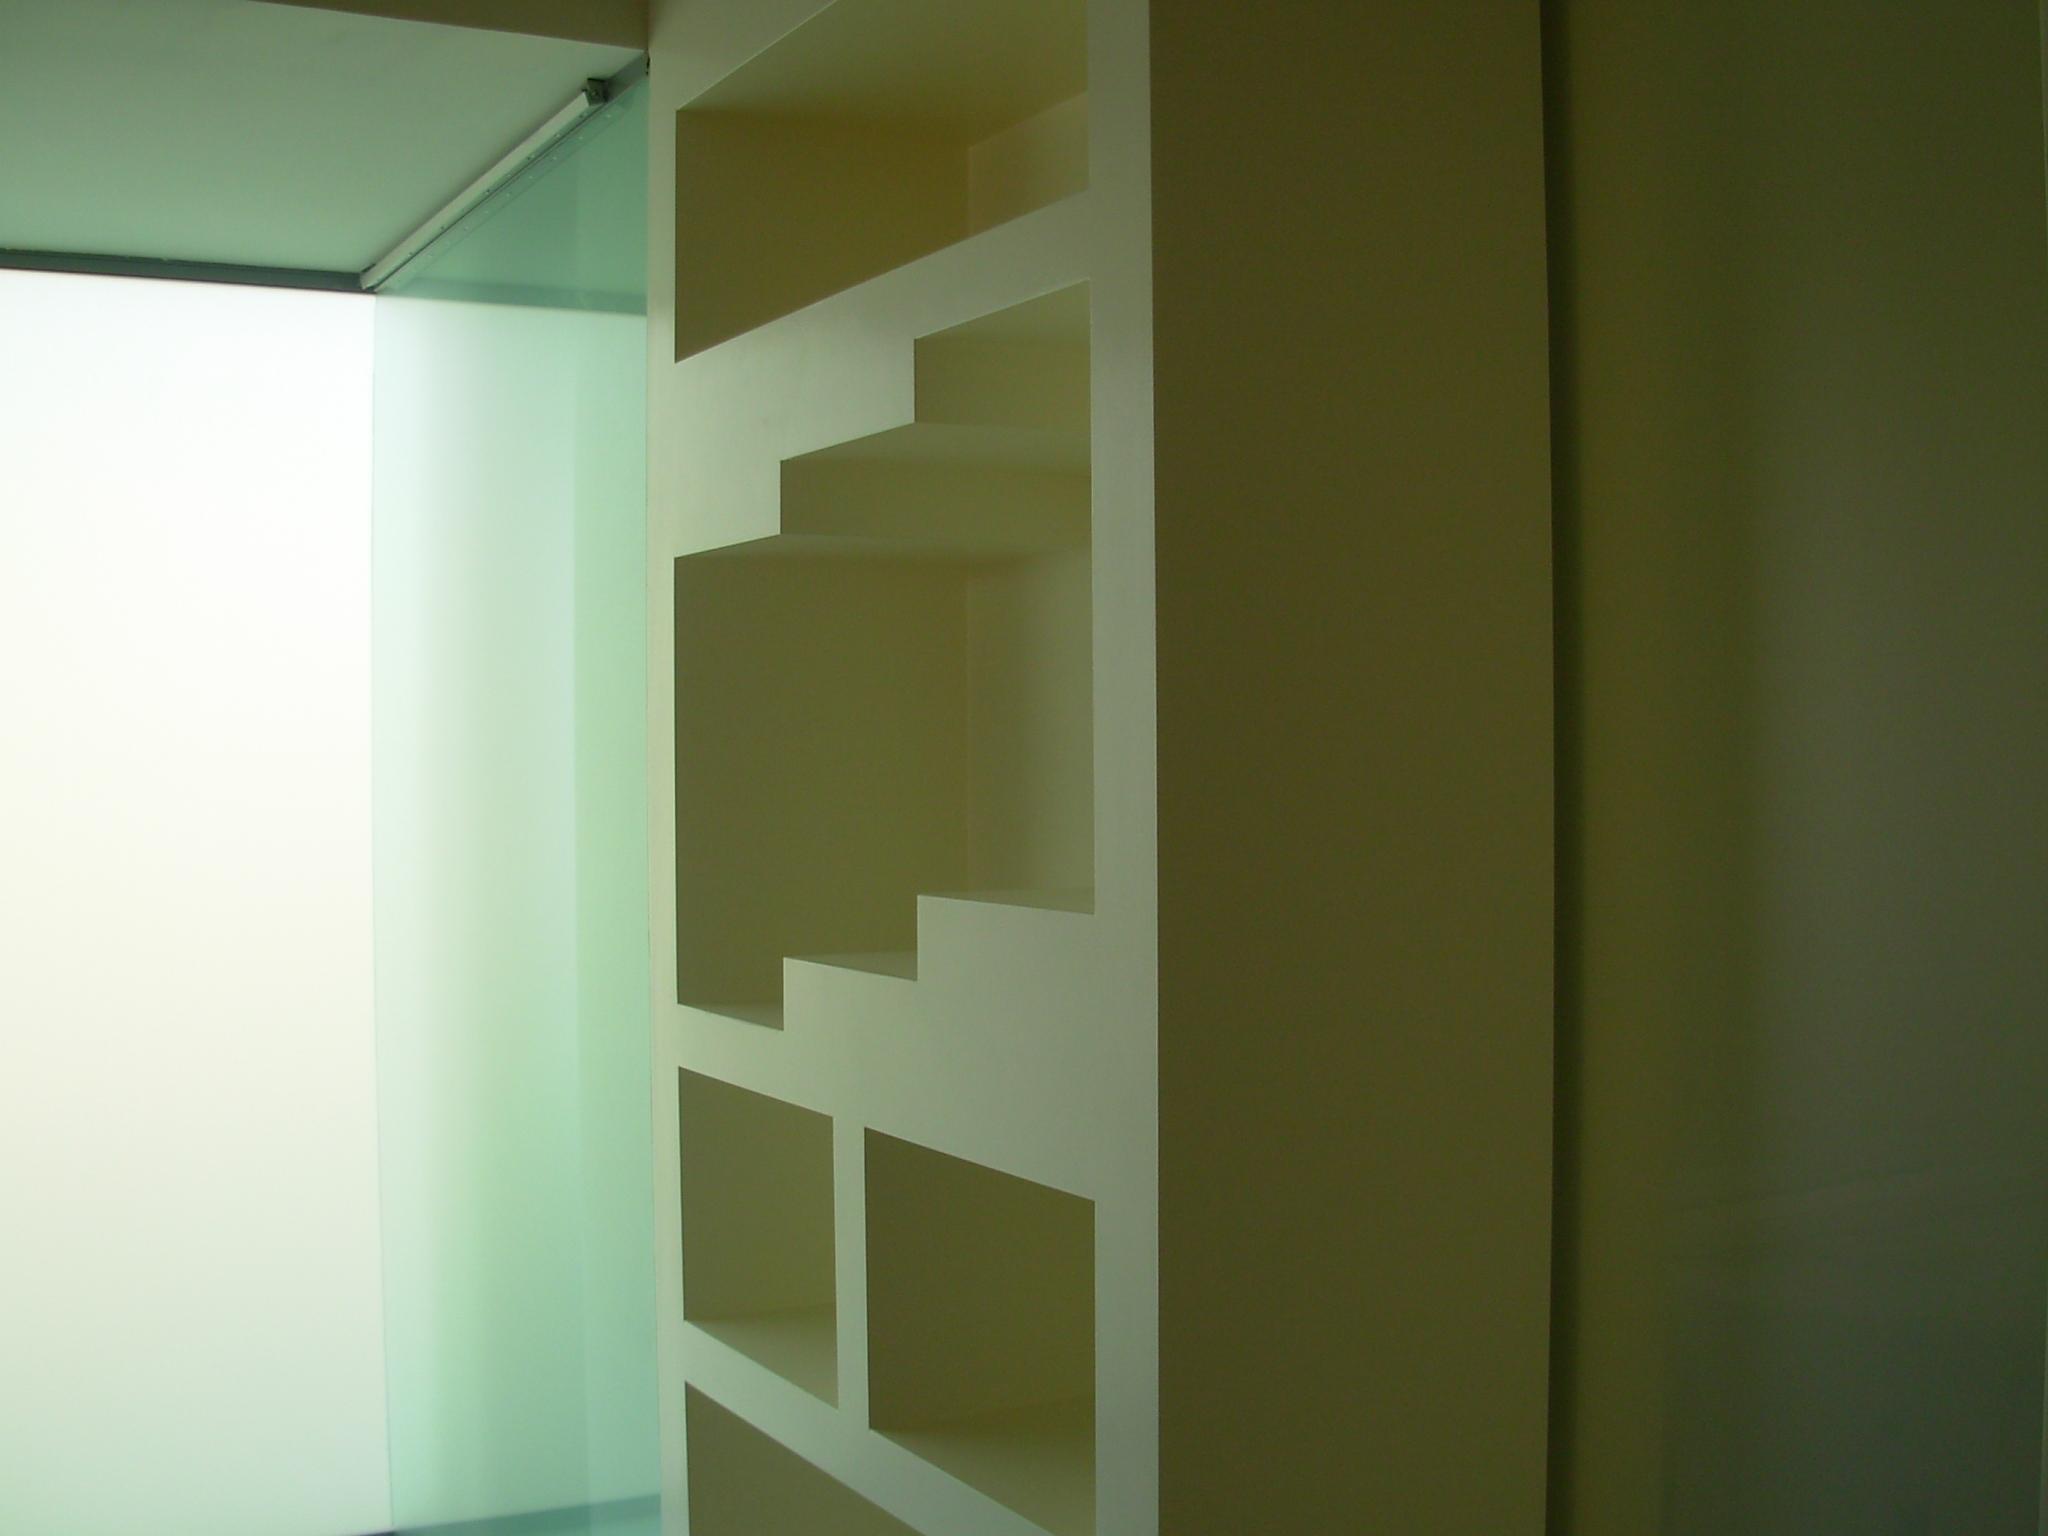 Casarella pitture edili antimuffa e decorative - Pareti decorative per interni ...